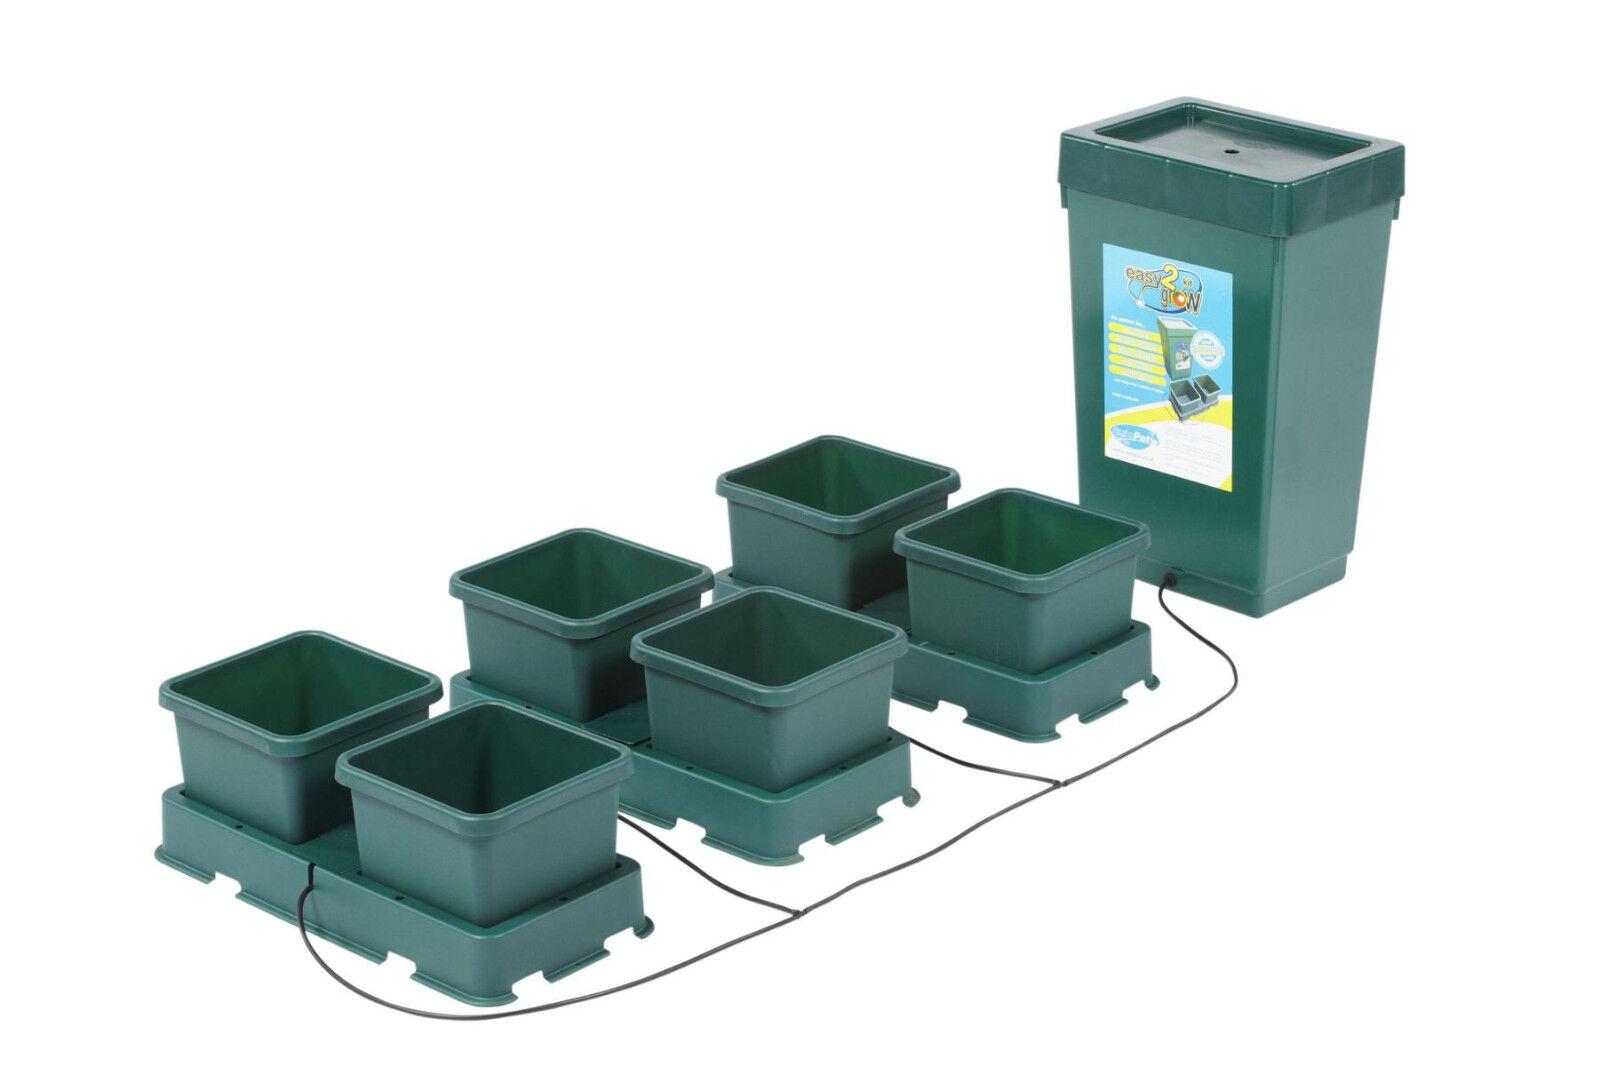 AUTOPOT AUTOPOT AUTOPOT Easy2grow 6POT System Automatische Bewässerung Hydrokultur Grow e1e497